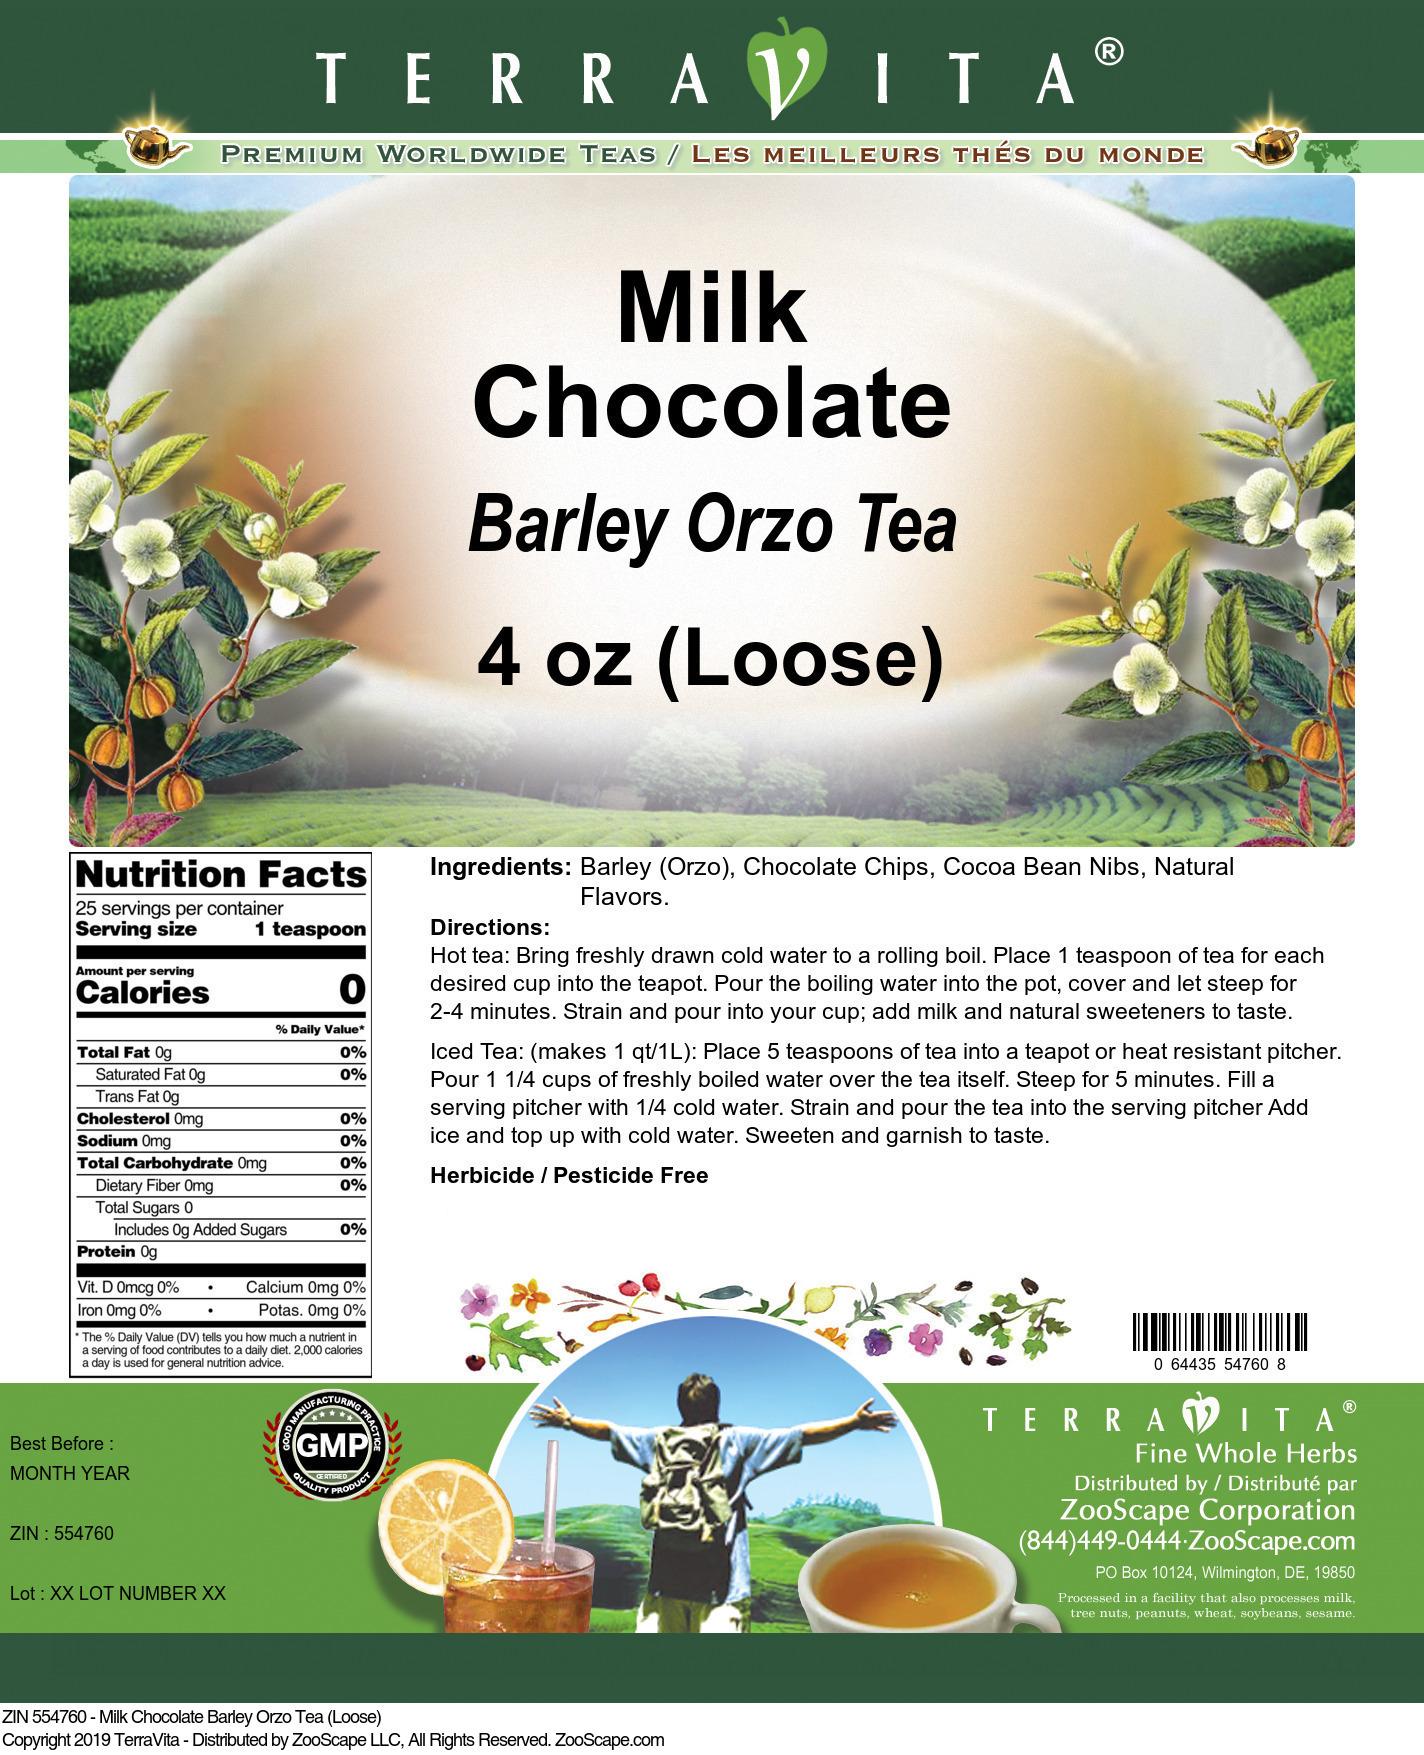 Milk Chocolate Barley Orzo